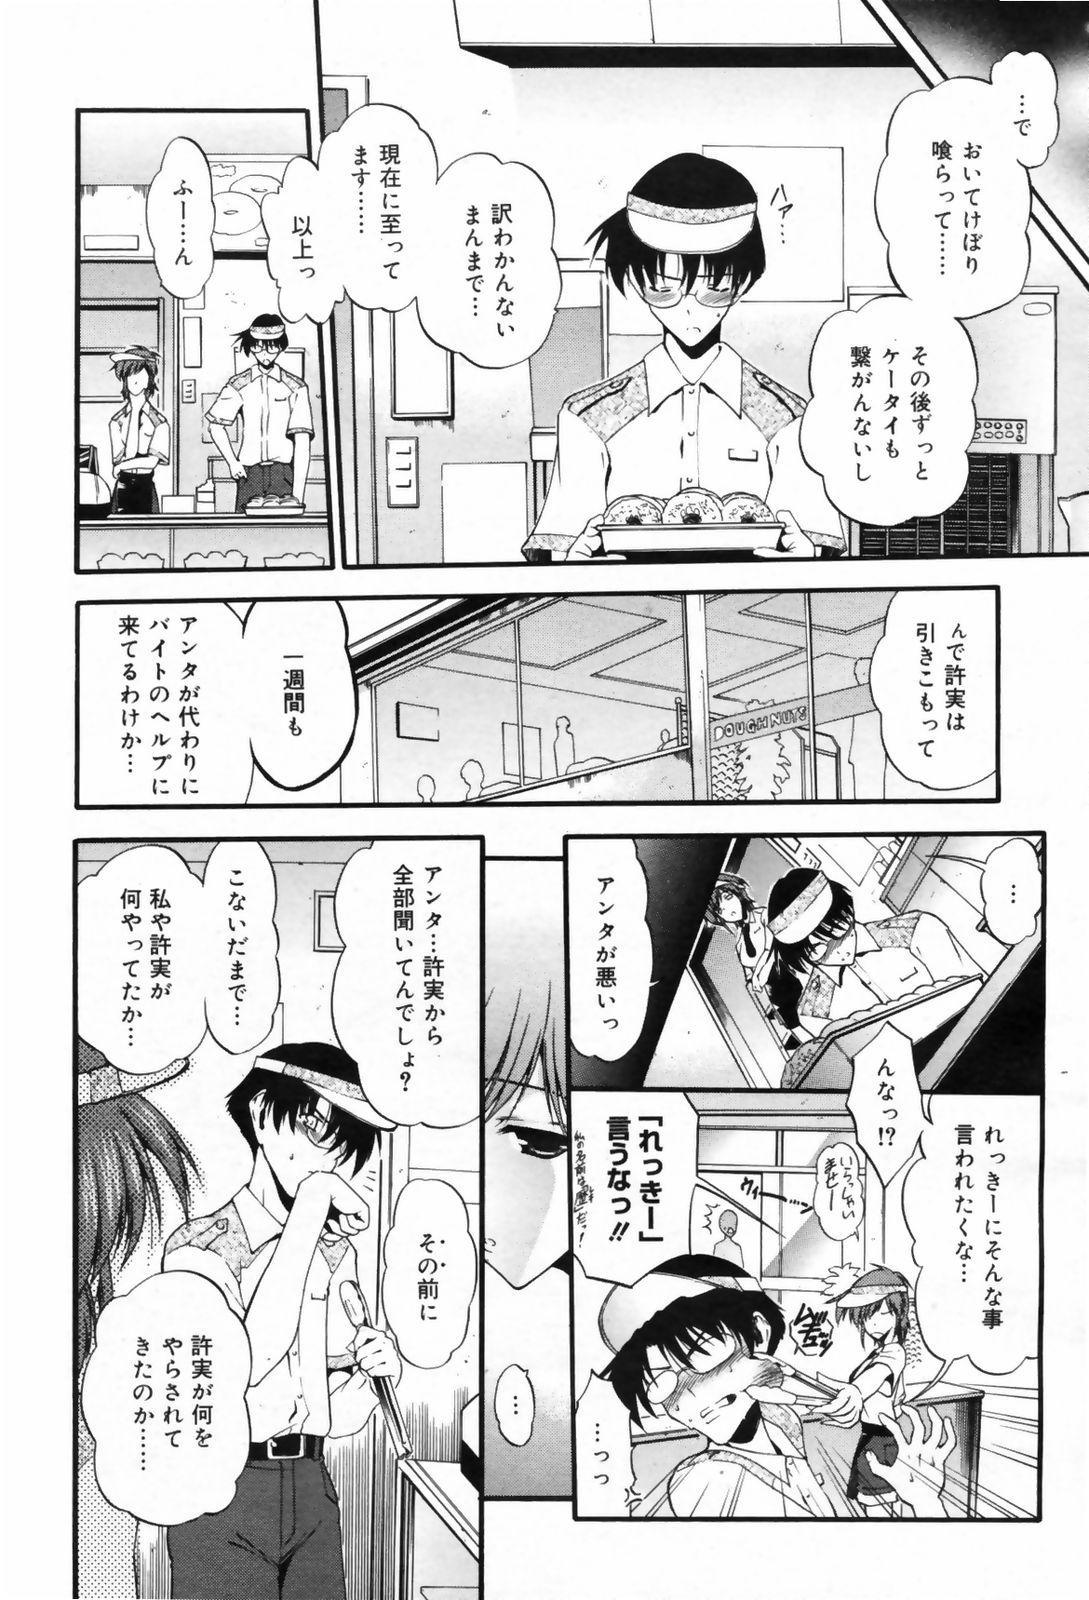 Manga Bangaichi 2009-02 Vol. 234 83